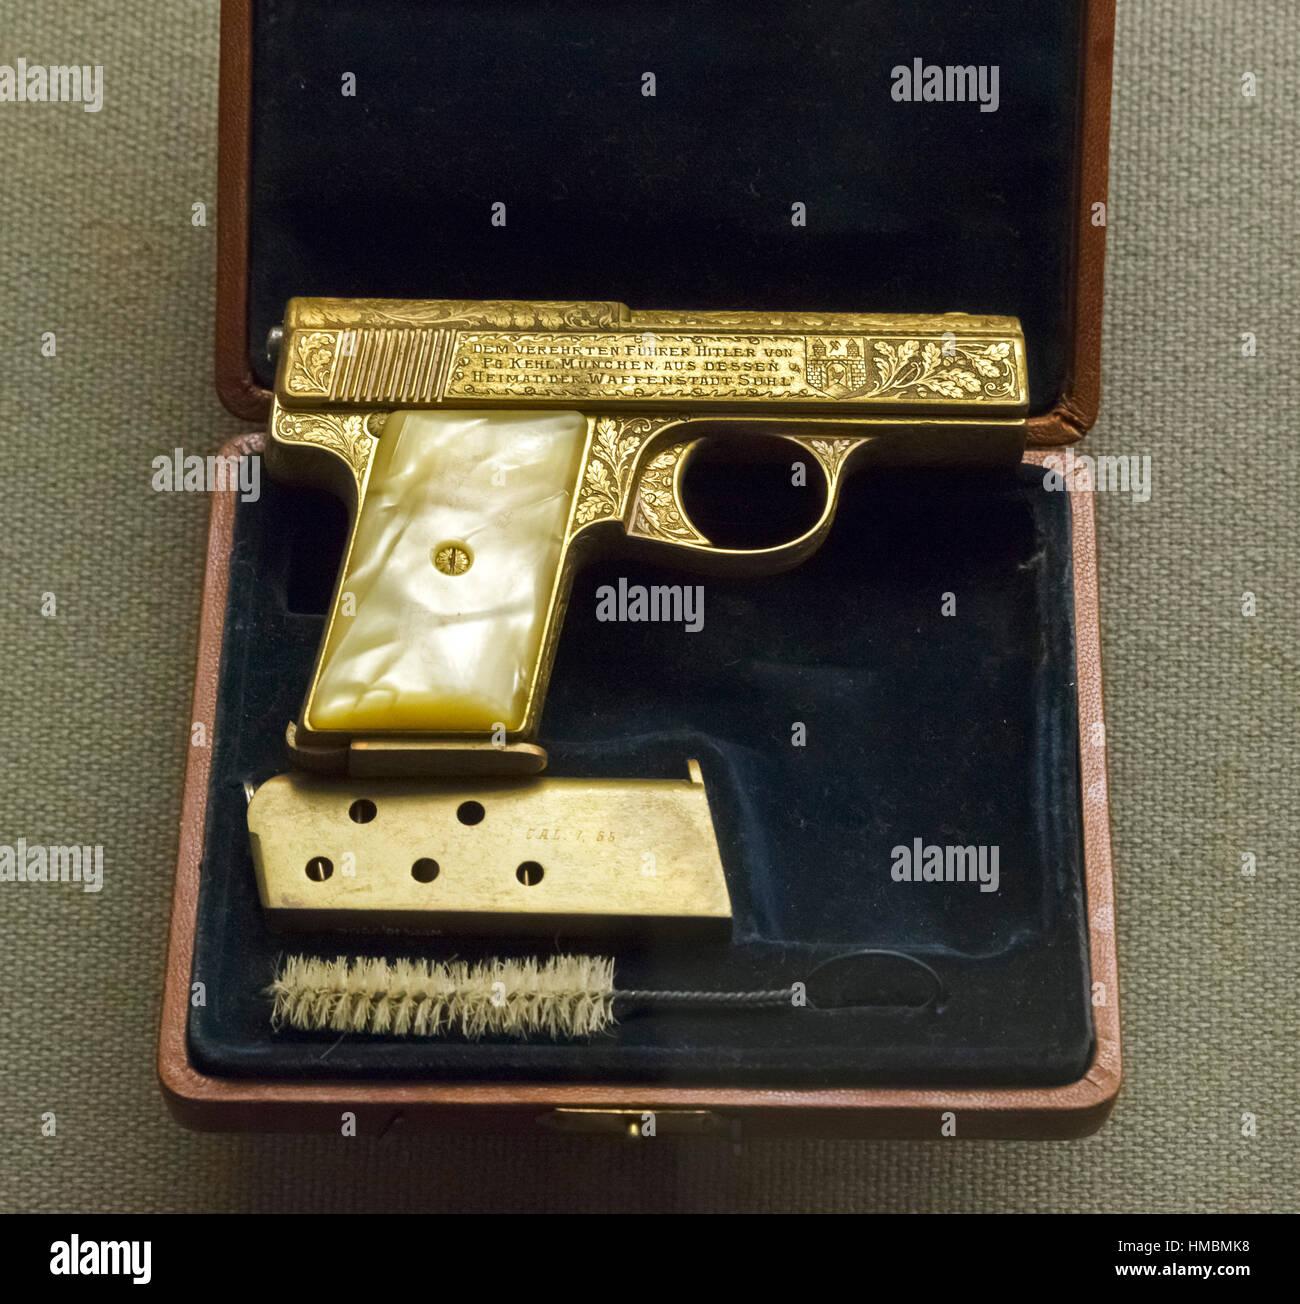 Adolf Hitler's Pistol. Liliput, Model I, .32 caliber pistol given to Adolf Hitler by Nazi Party member Max Kehl - Stock Image